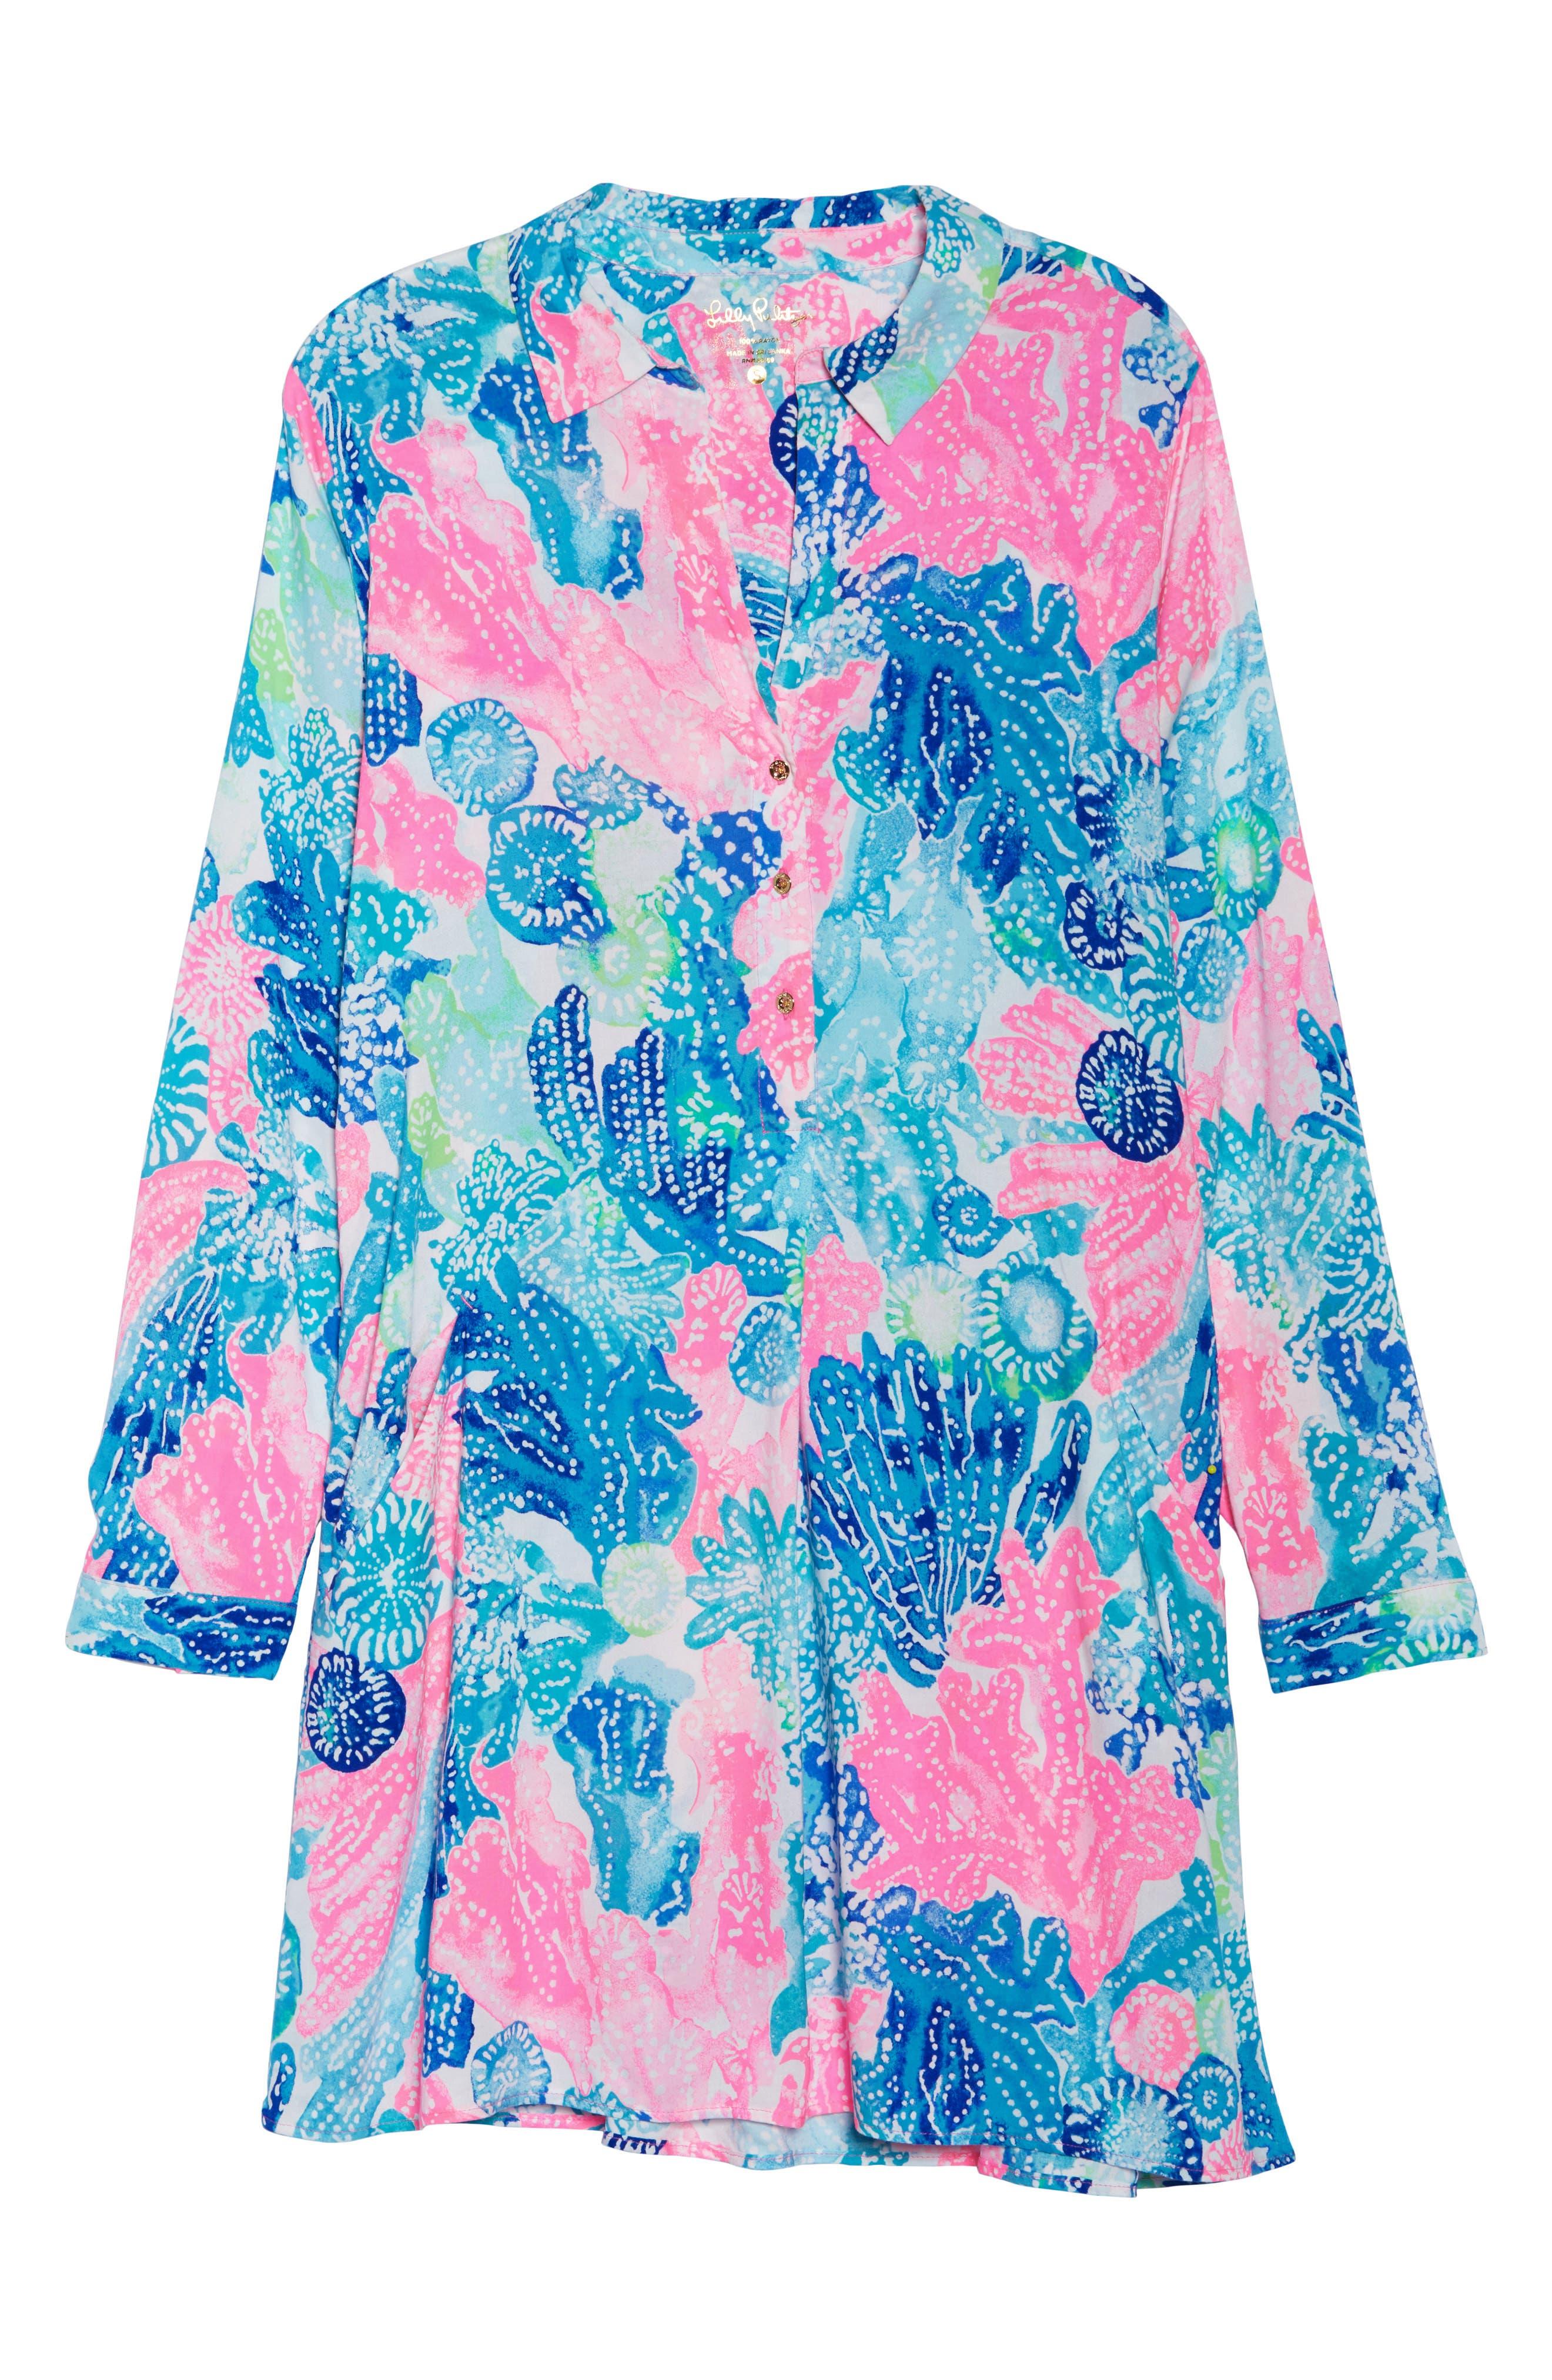 Lillith Shirtdress,                             Alternate thumbnail 7, color,                             650